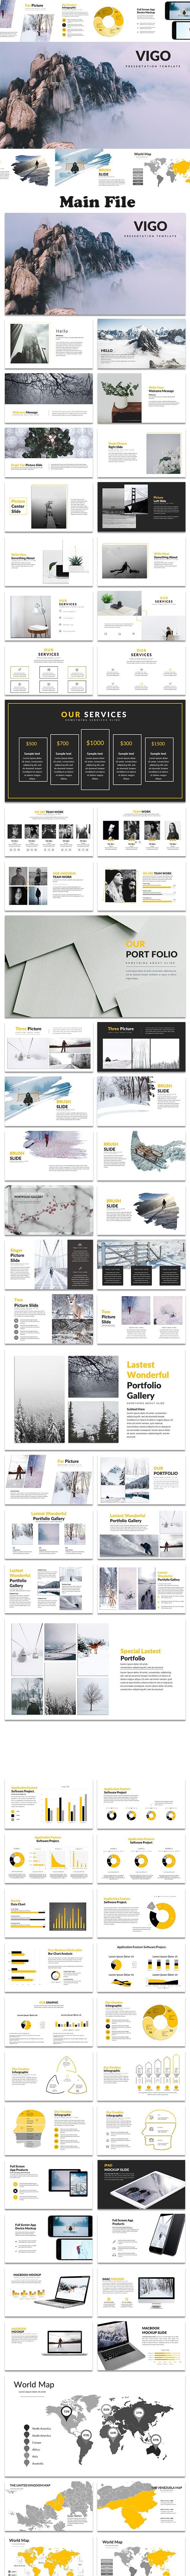 Vigo - Creative Google Slide Template - Google Slides Presentation Templates